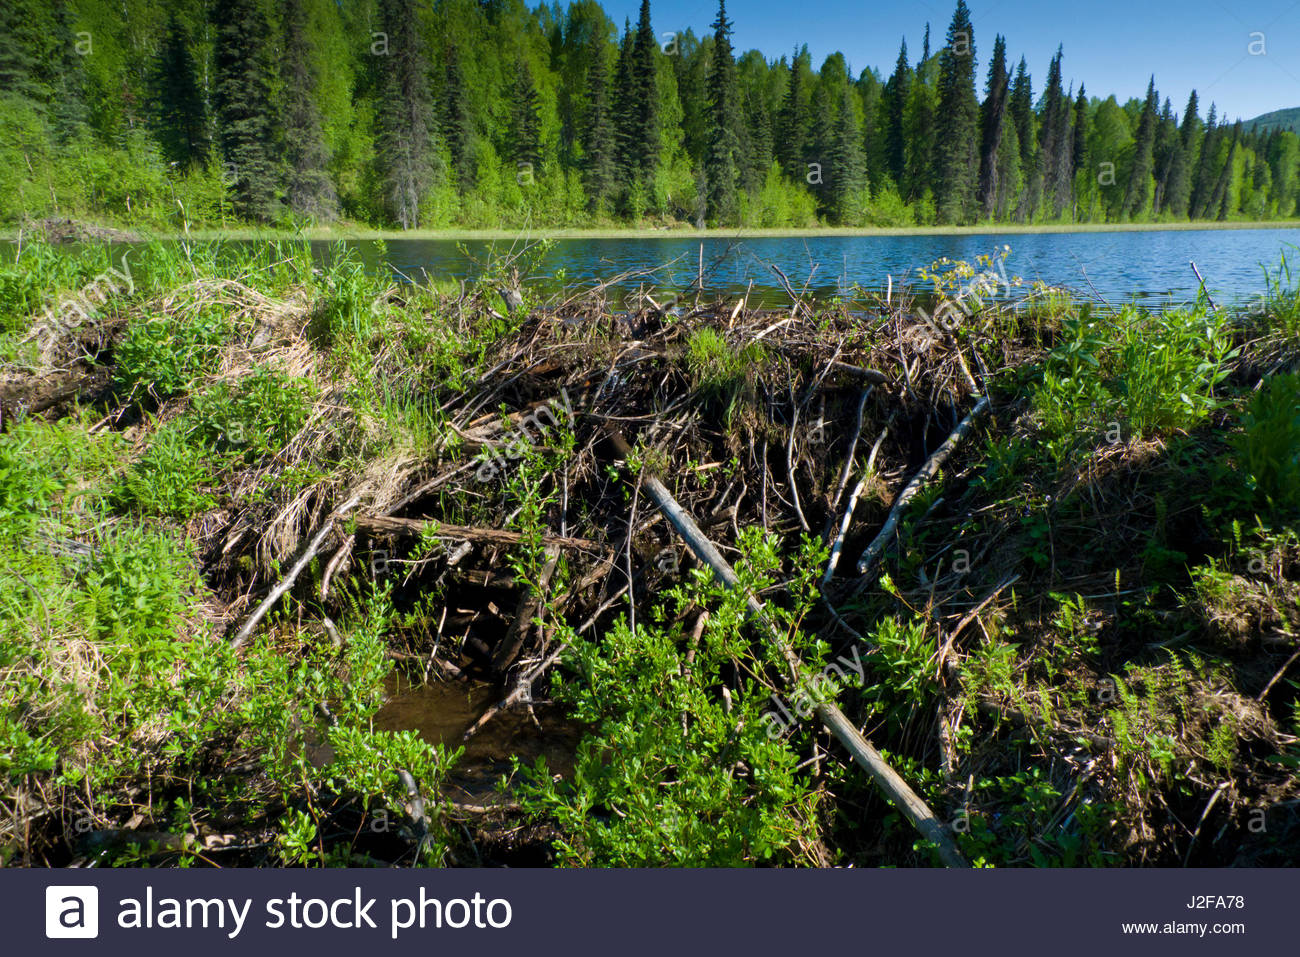 Alaska matanuska susitna county talkeetna - Piles Of Sticks And Mud Of A Beaver Dam Holding Back A Reservoir Of Fresh Water Behind It Talkeetna Mountains Matanuska Susitna Borough Alaska Usa